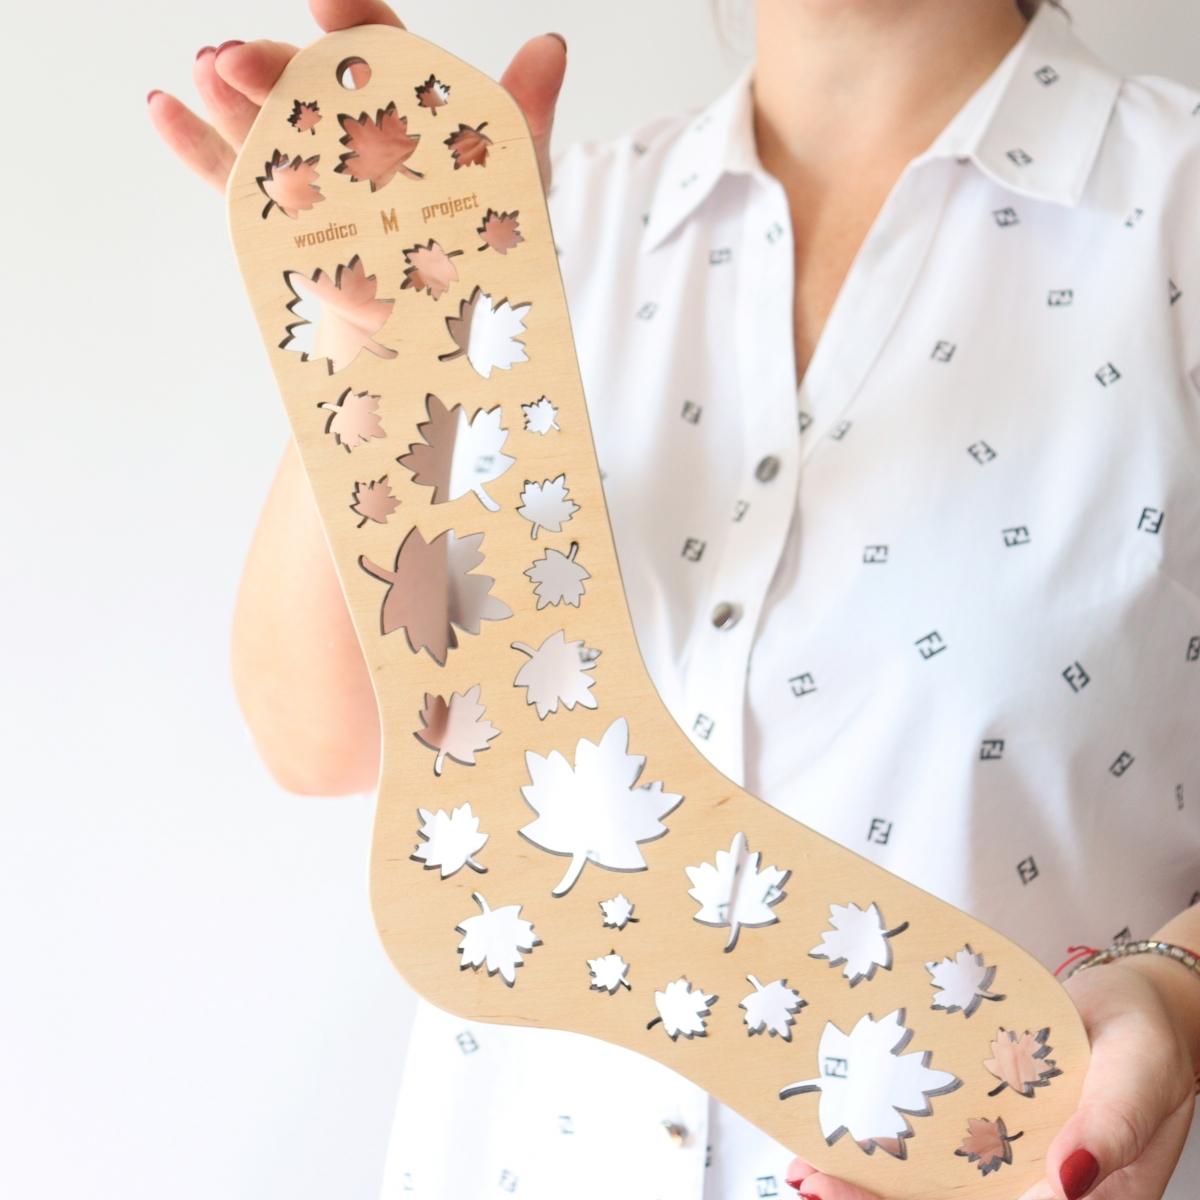 woodico.pro wooden sock blockers maple leaf 6 1200x1200 - Wooden sock blockers / Maple-Leaf